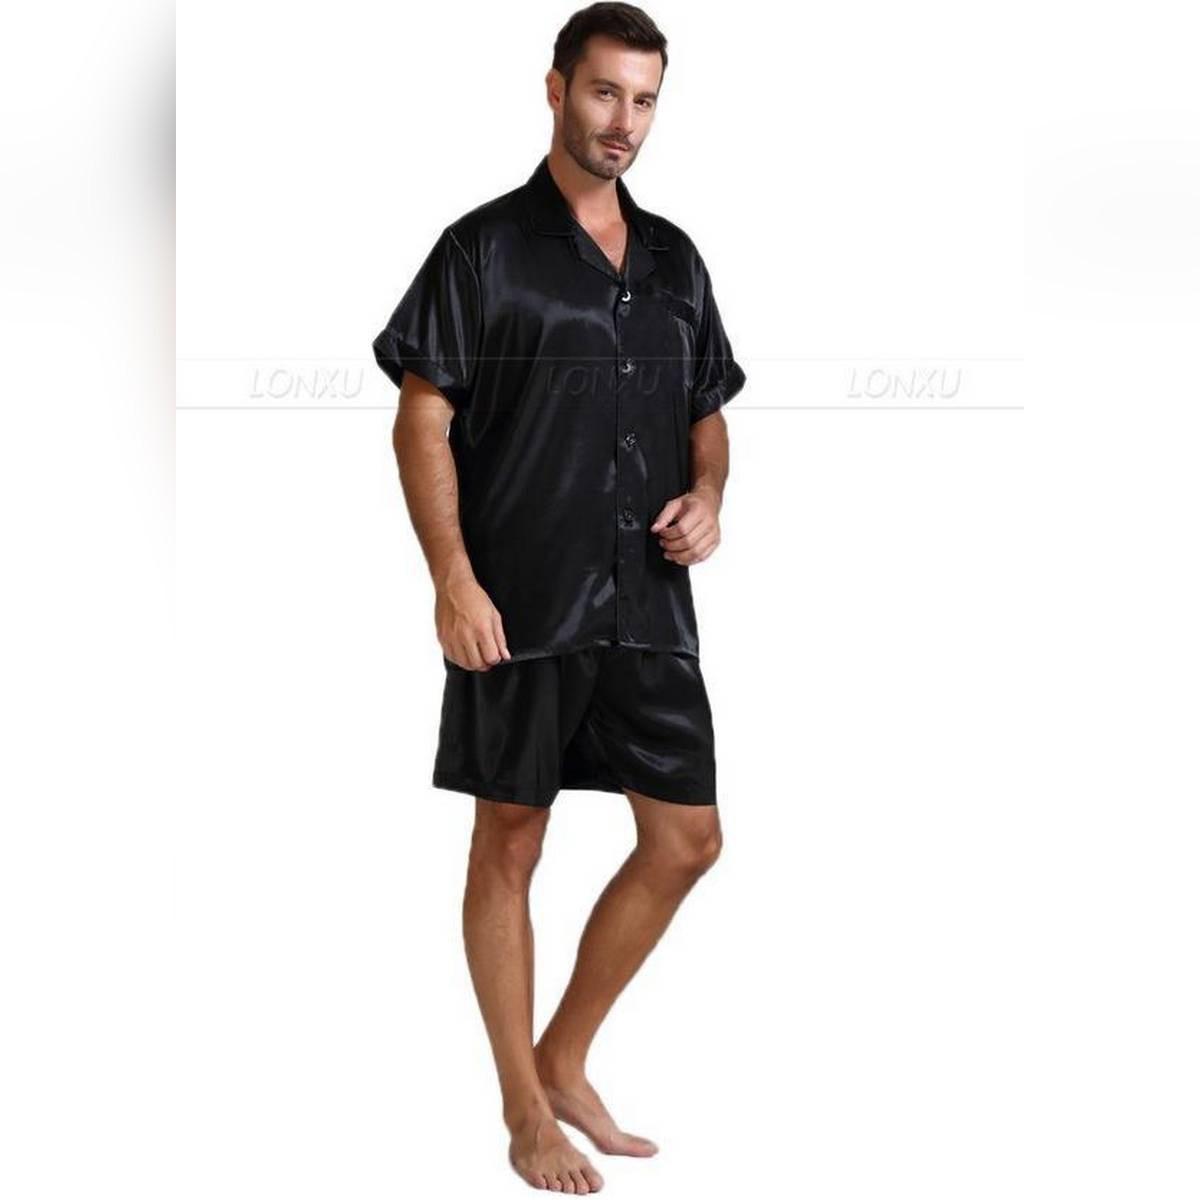 Sebastian silky satin Men's short sleeve shirt with boxer short 2 piece set pajama set  Supreme Mens Collection Vol 1 Soft against skin sleepwear